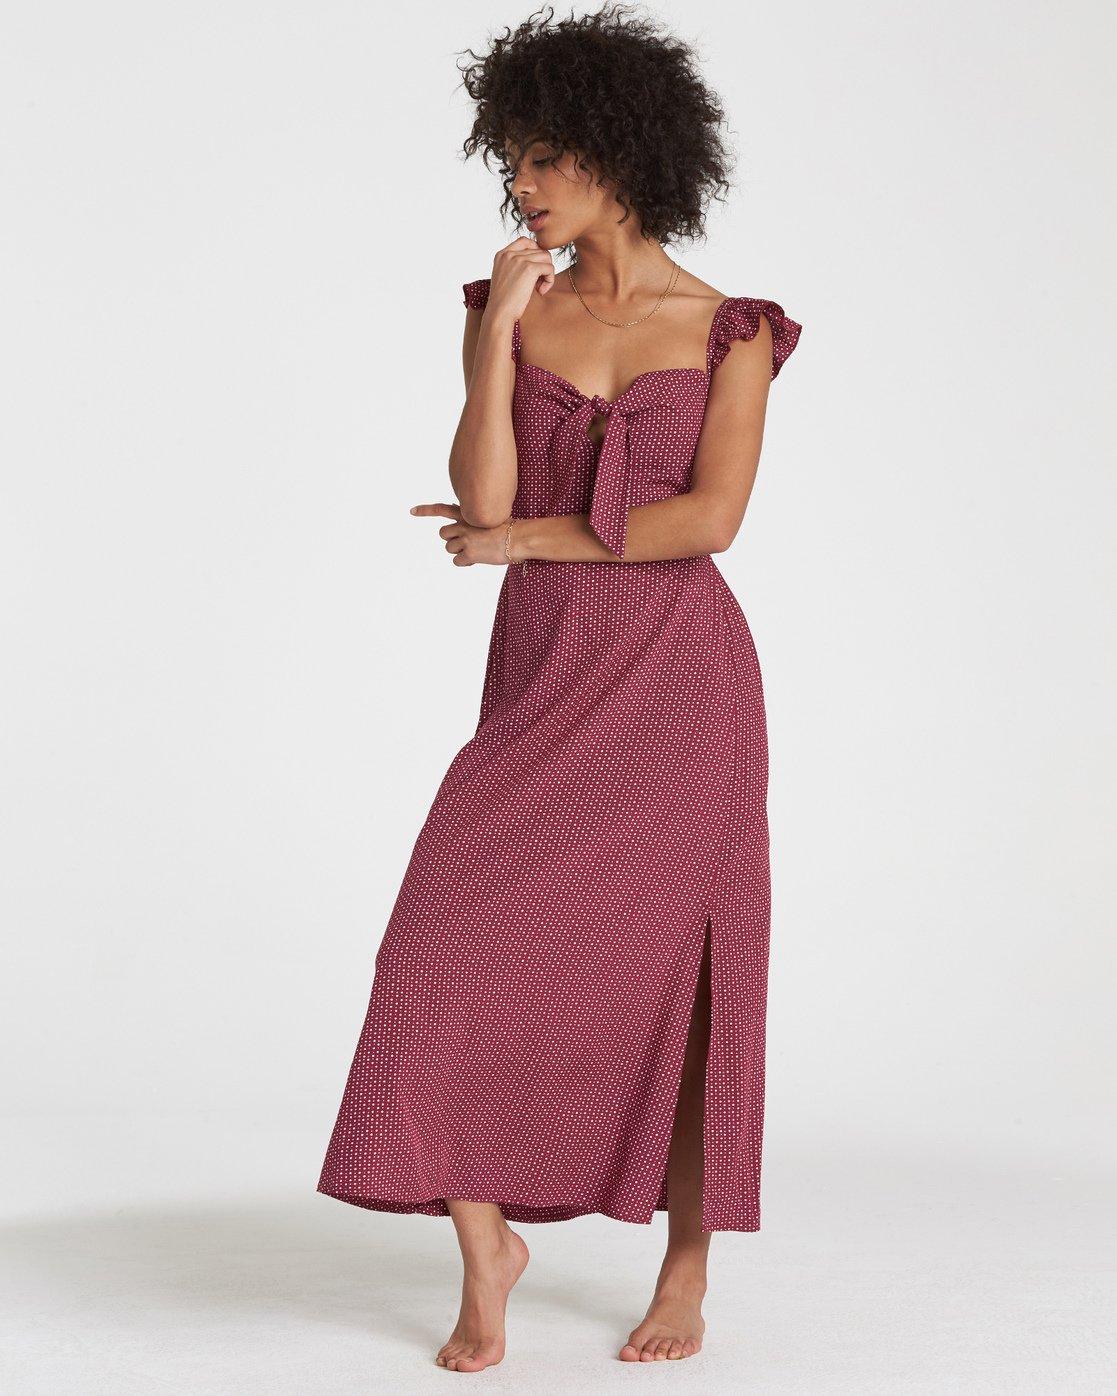 Cherry Lips Dress